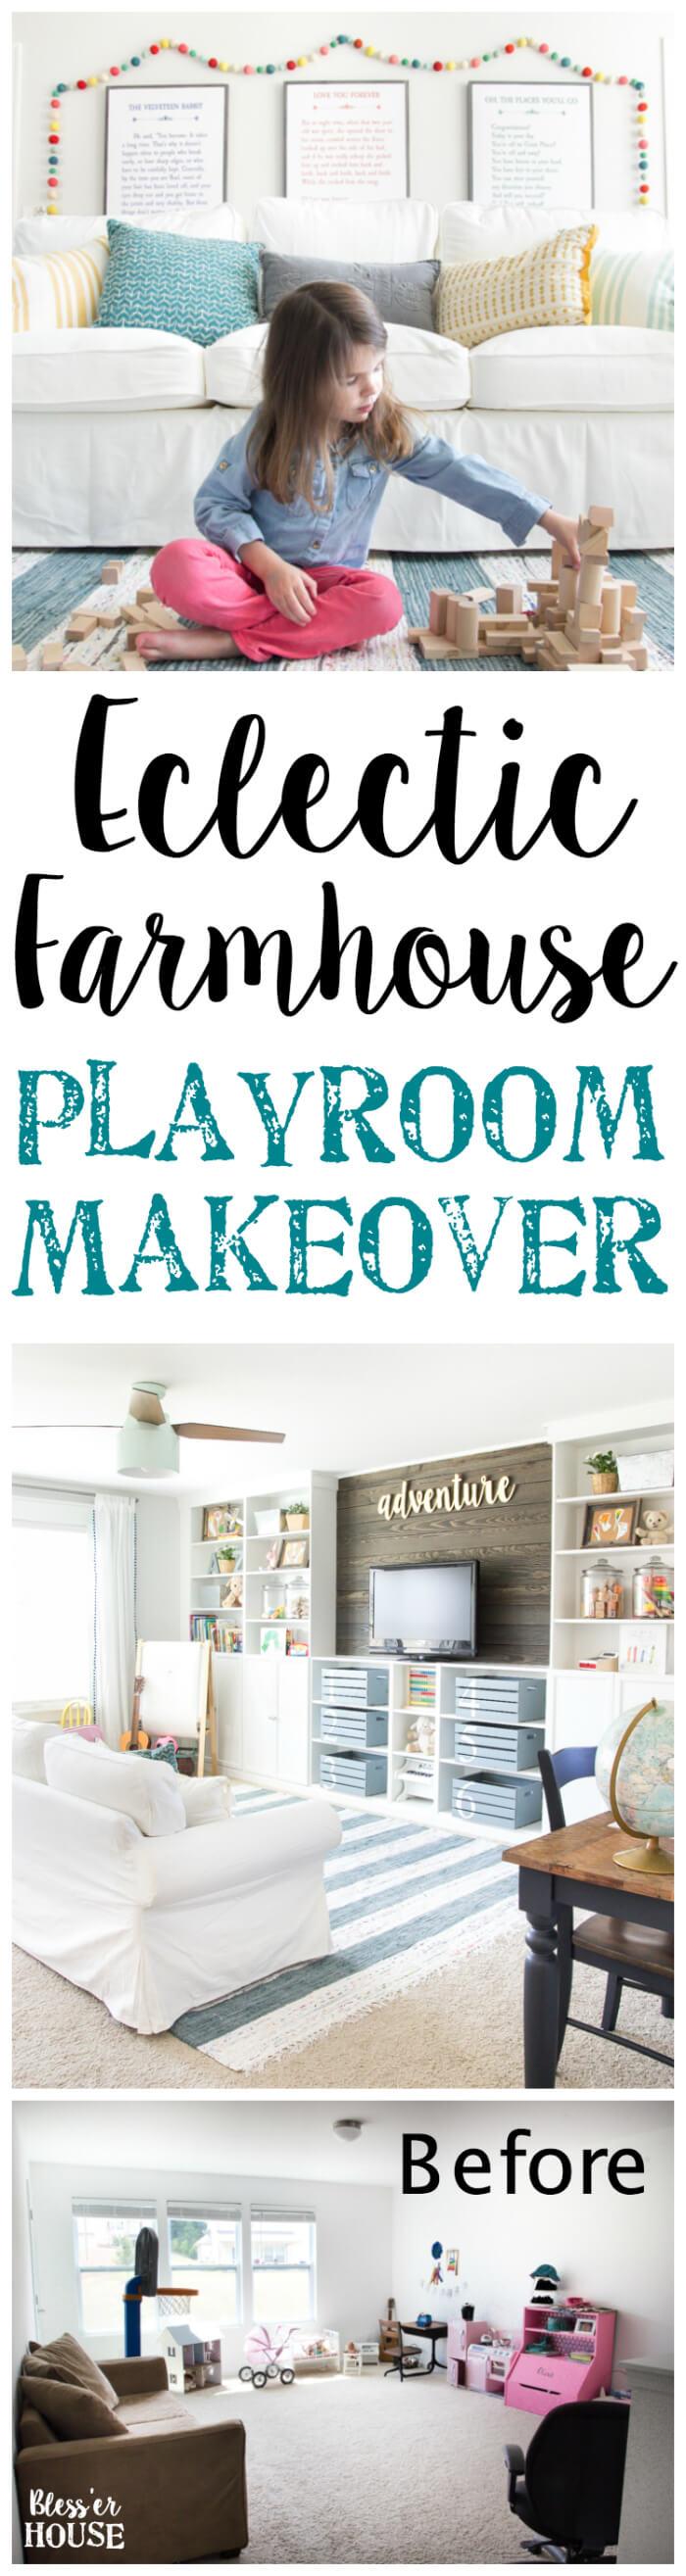 Give Aspiring Designers a Chic Playroom